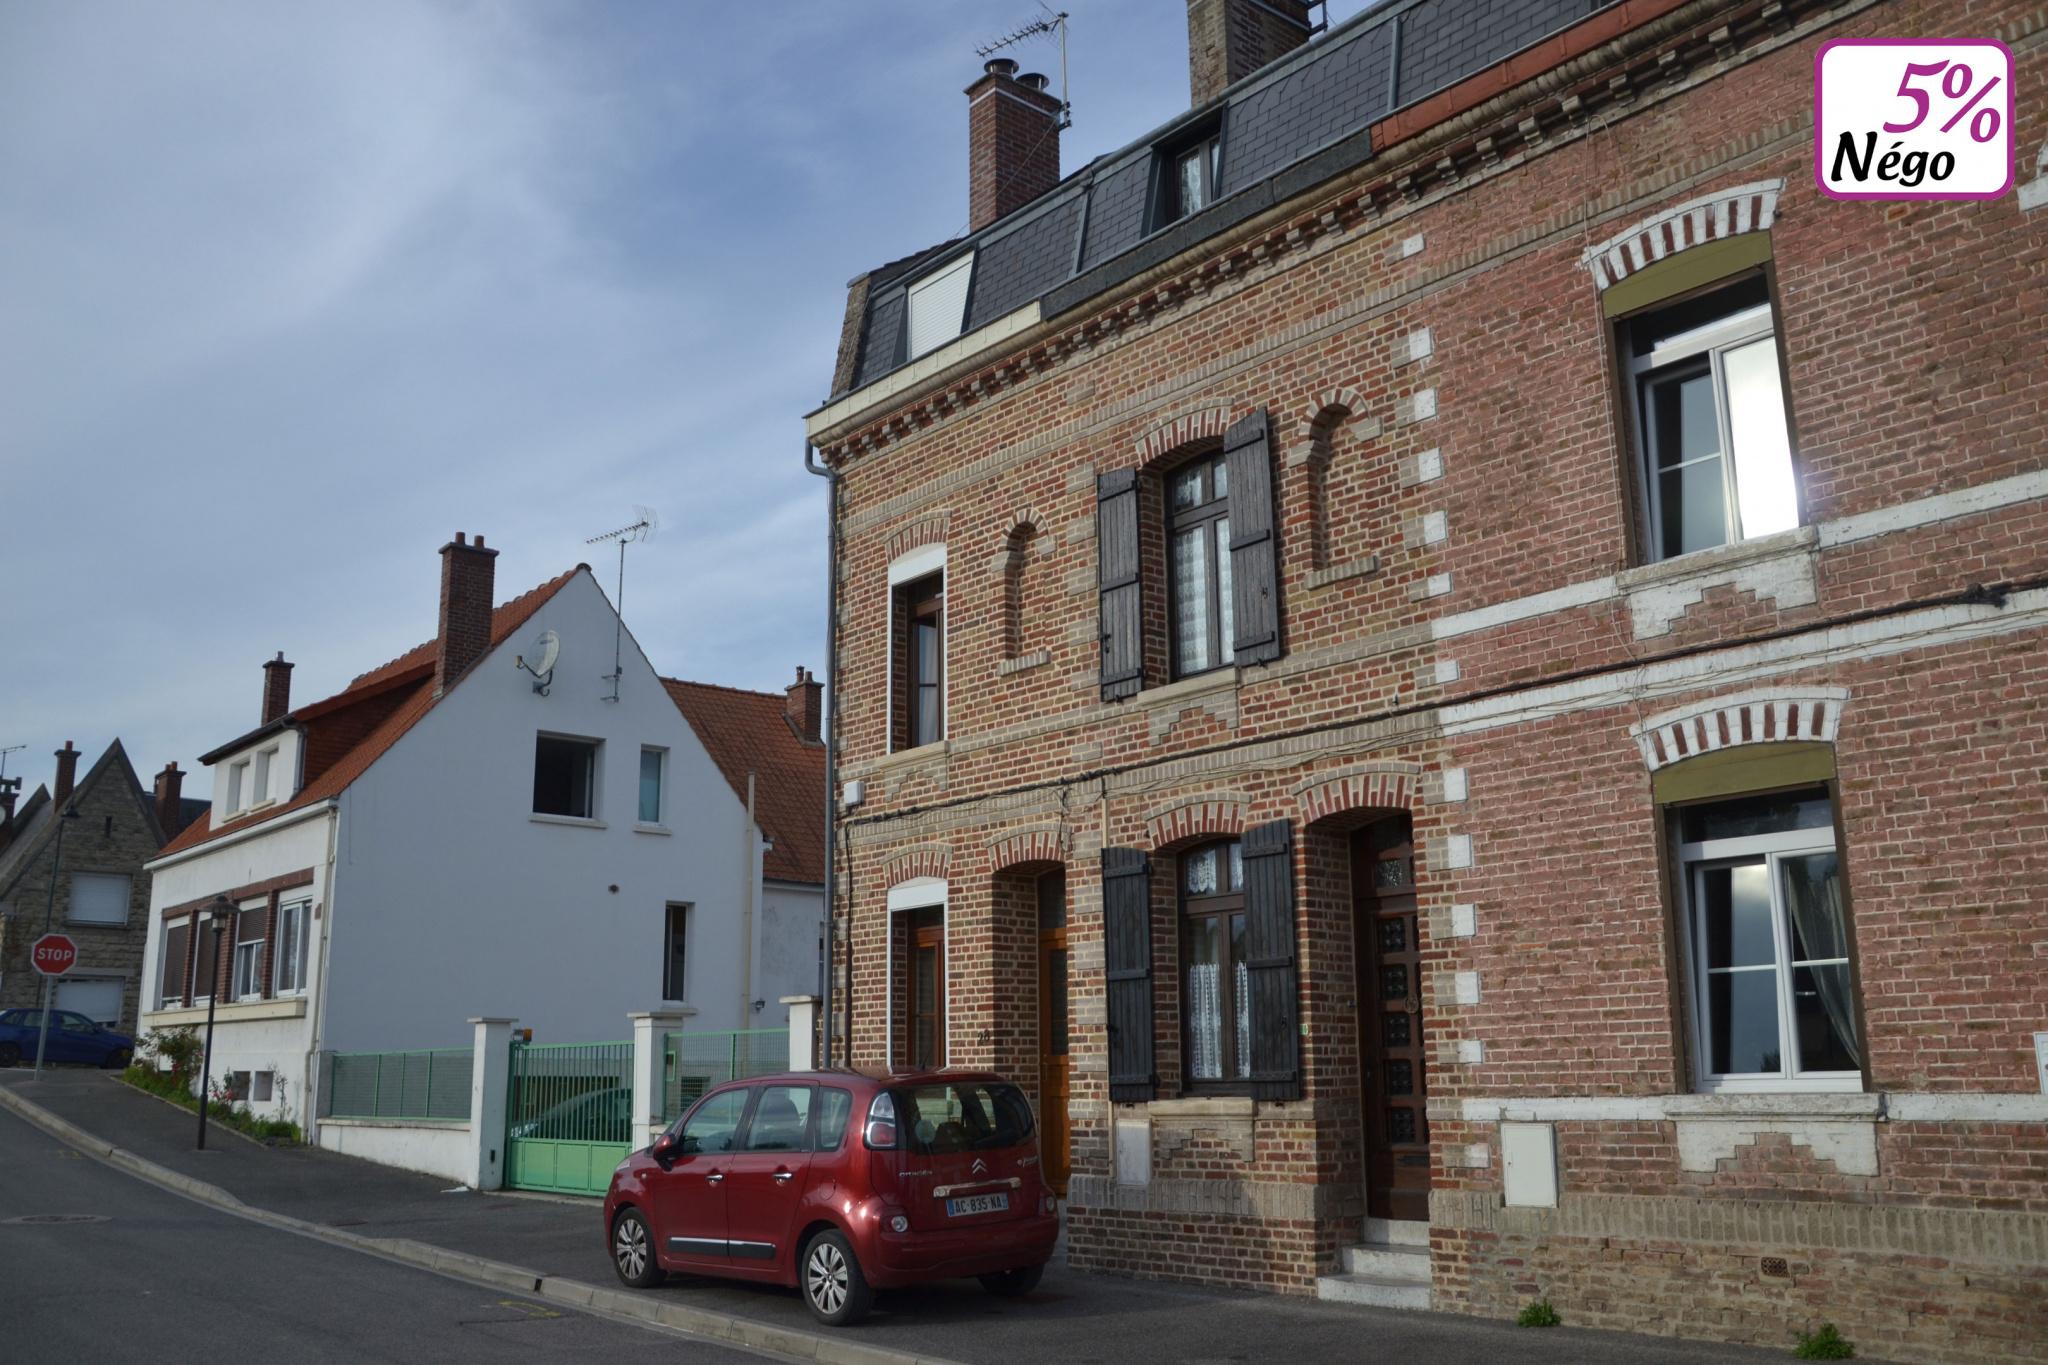 Maison type amiénoise 2 chambres à PIcquigny